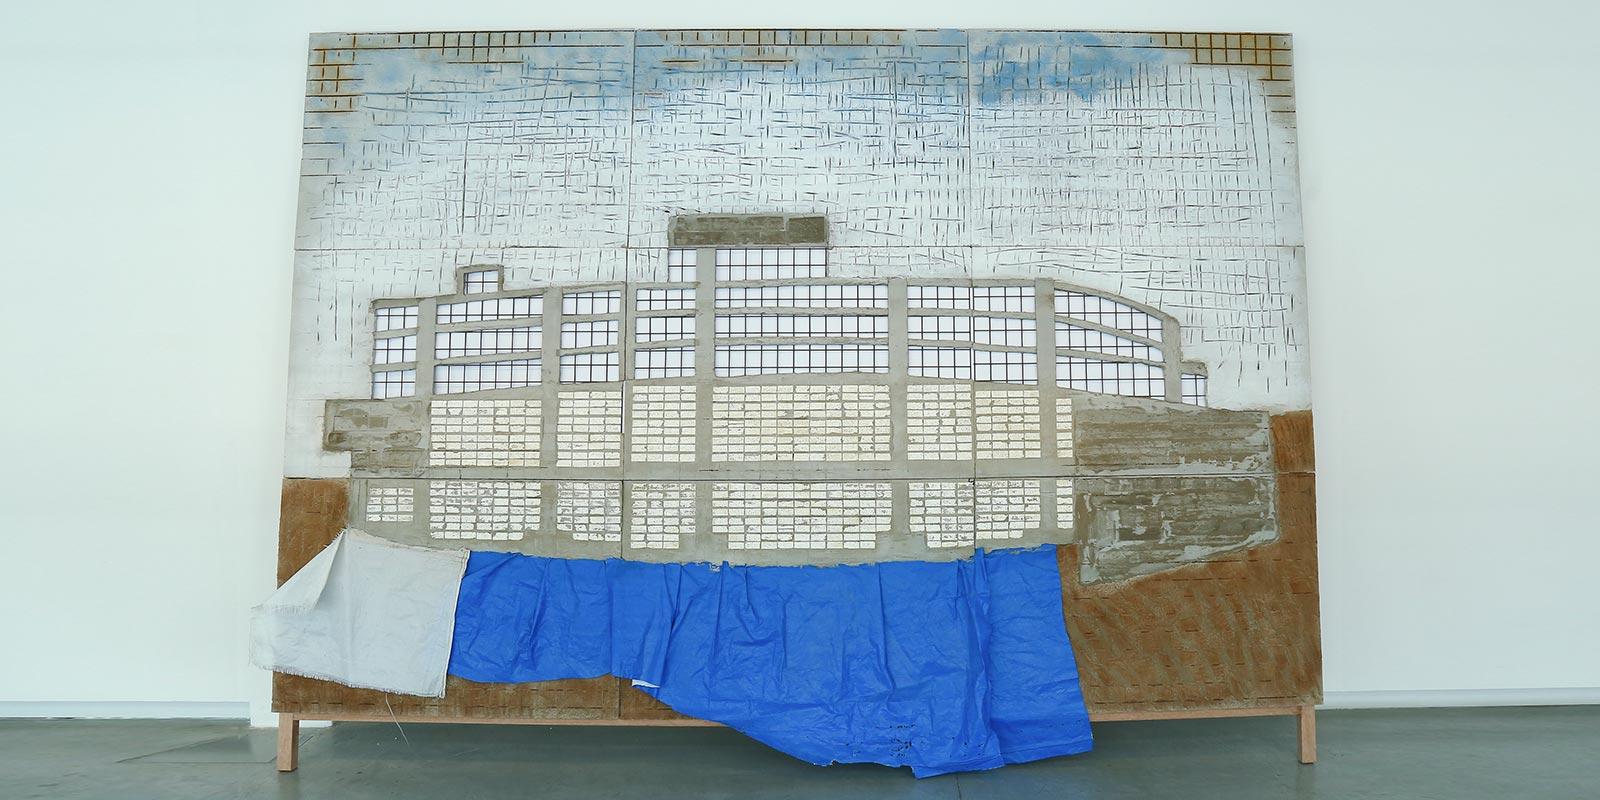 Marwan Rechmaoui, Blue Building, 2015. Concrete, iron, nylon, soil, Styrofoam. Image taken from Hadara Magazine website.